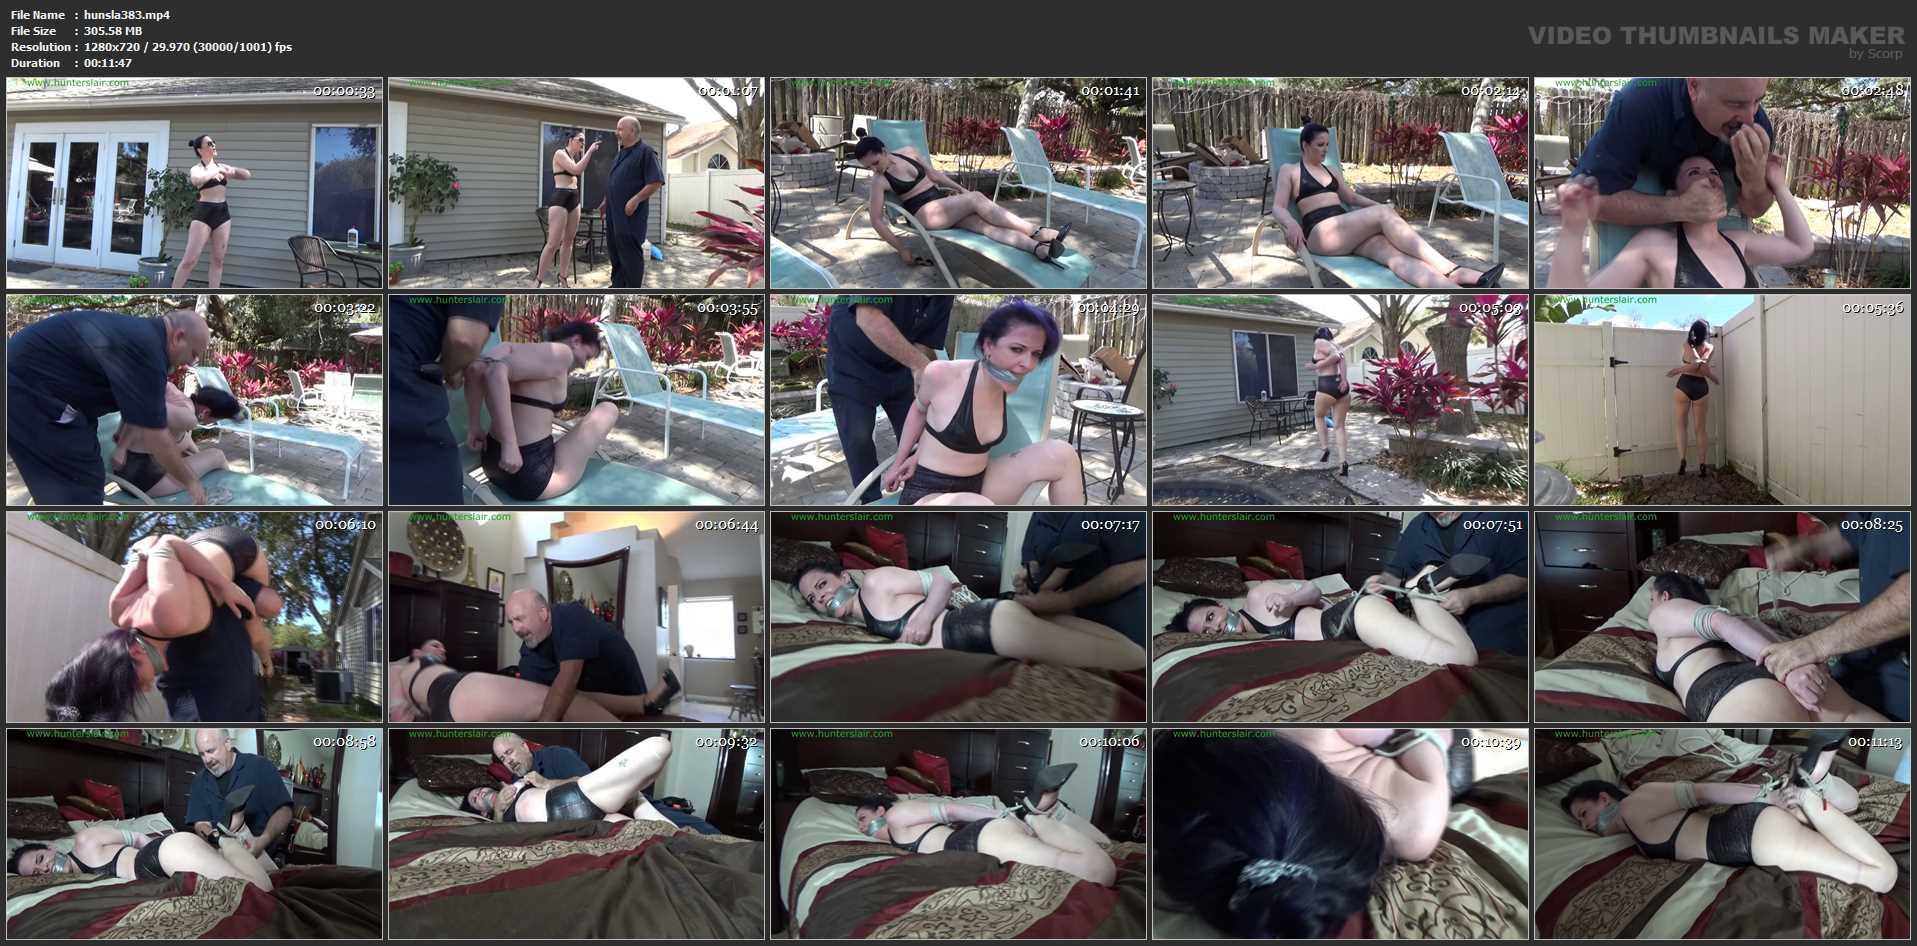 [HUNTERSLAIR] Haughty bikini clad prig overpowered by her handyman. Featuring: Caroline Pierce [HD][720p][MP4]